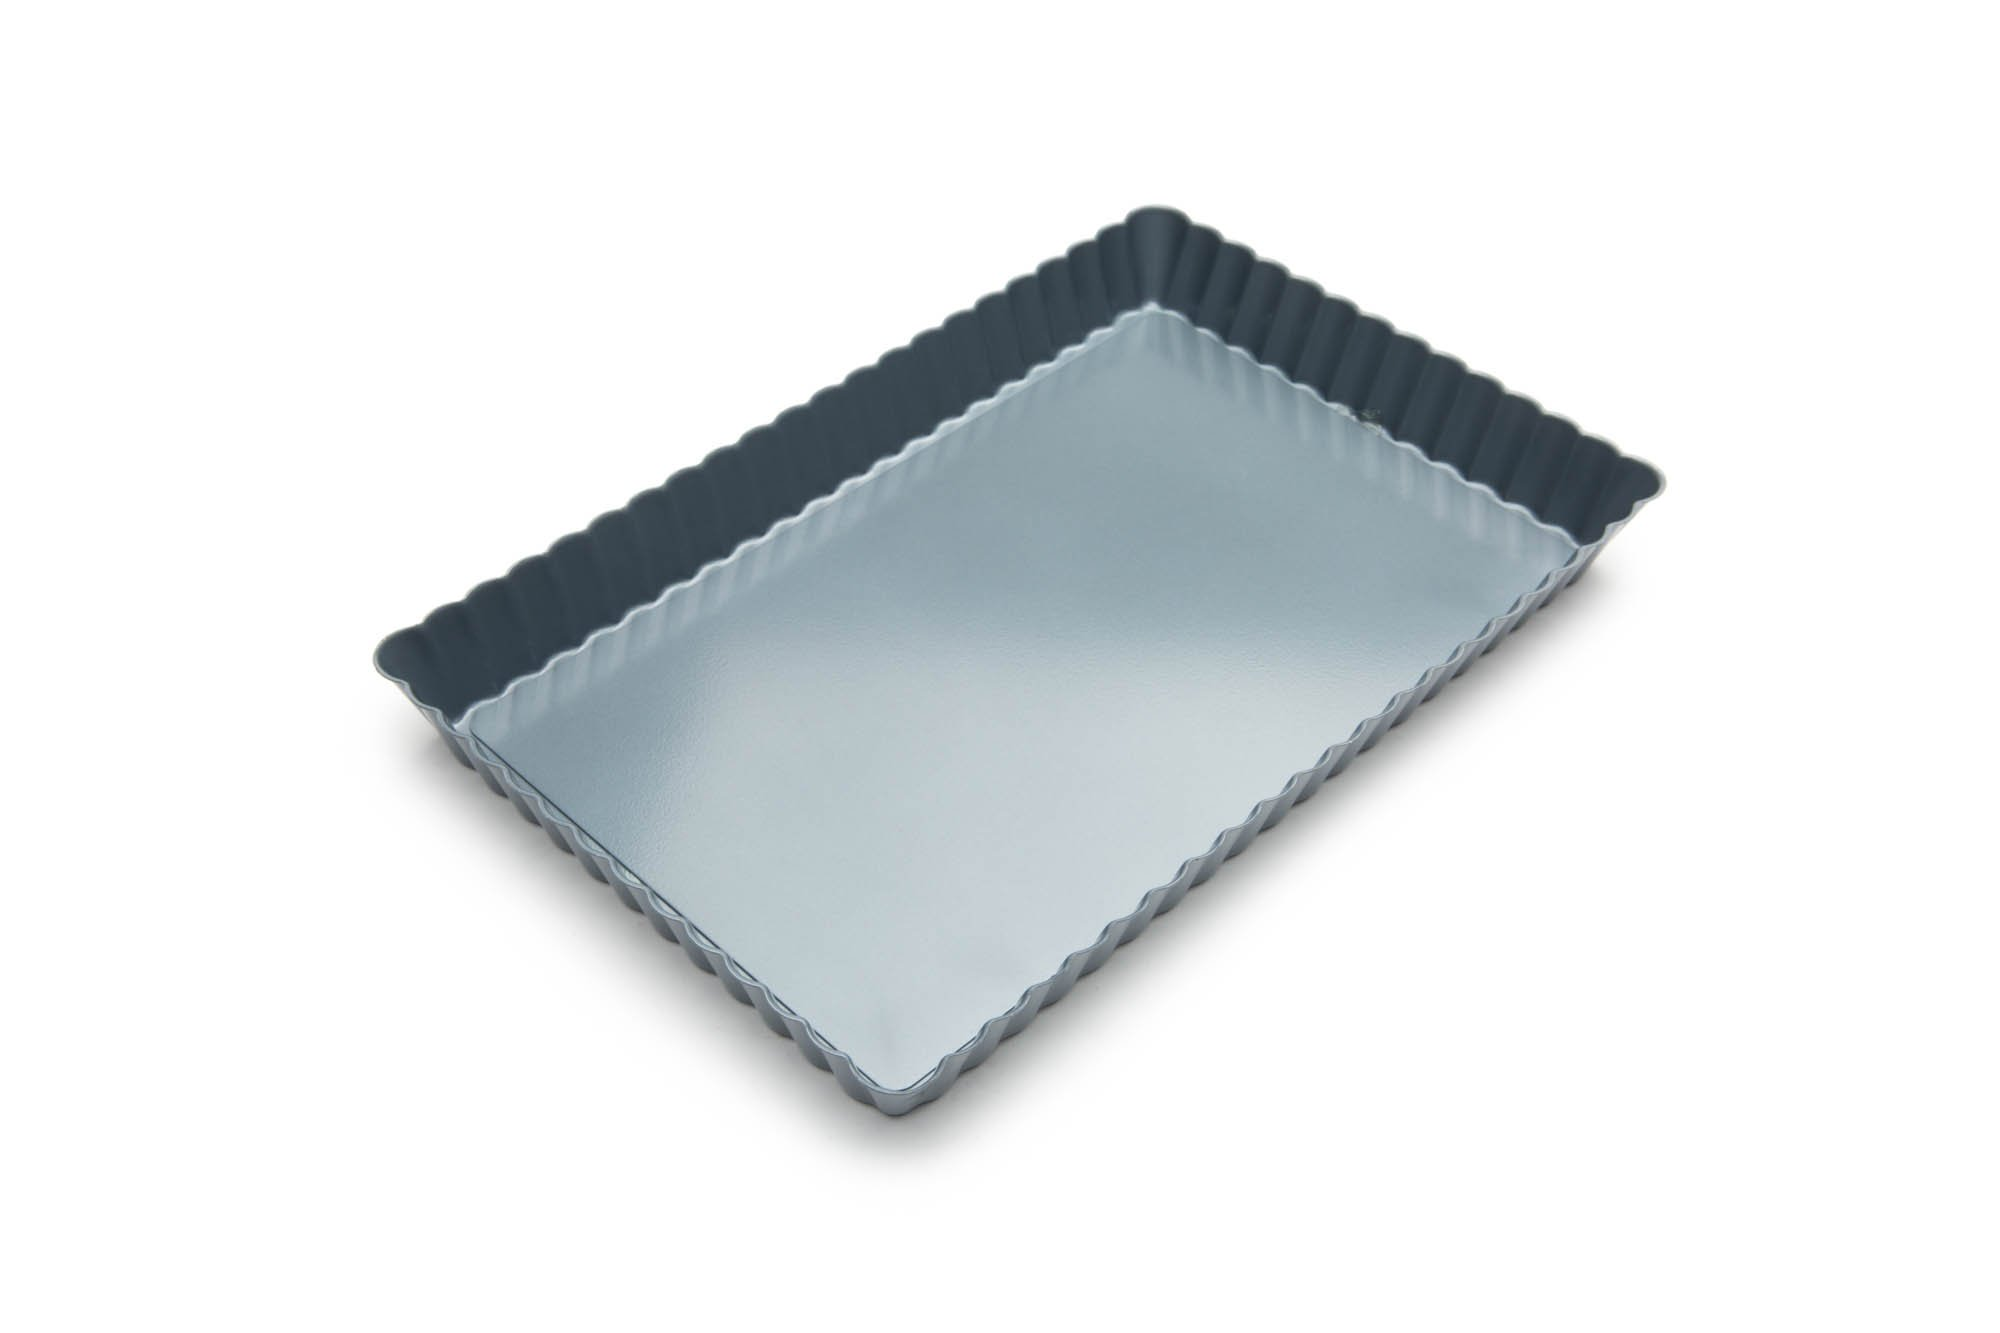 Fox Run 44505 Rectangular Loose Bottom Tart/Quiche Pan, Preferred Non-Stick, 11-Inch